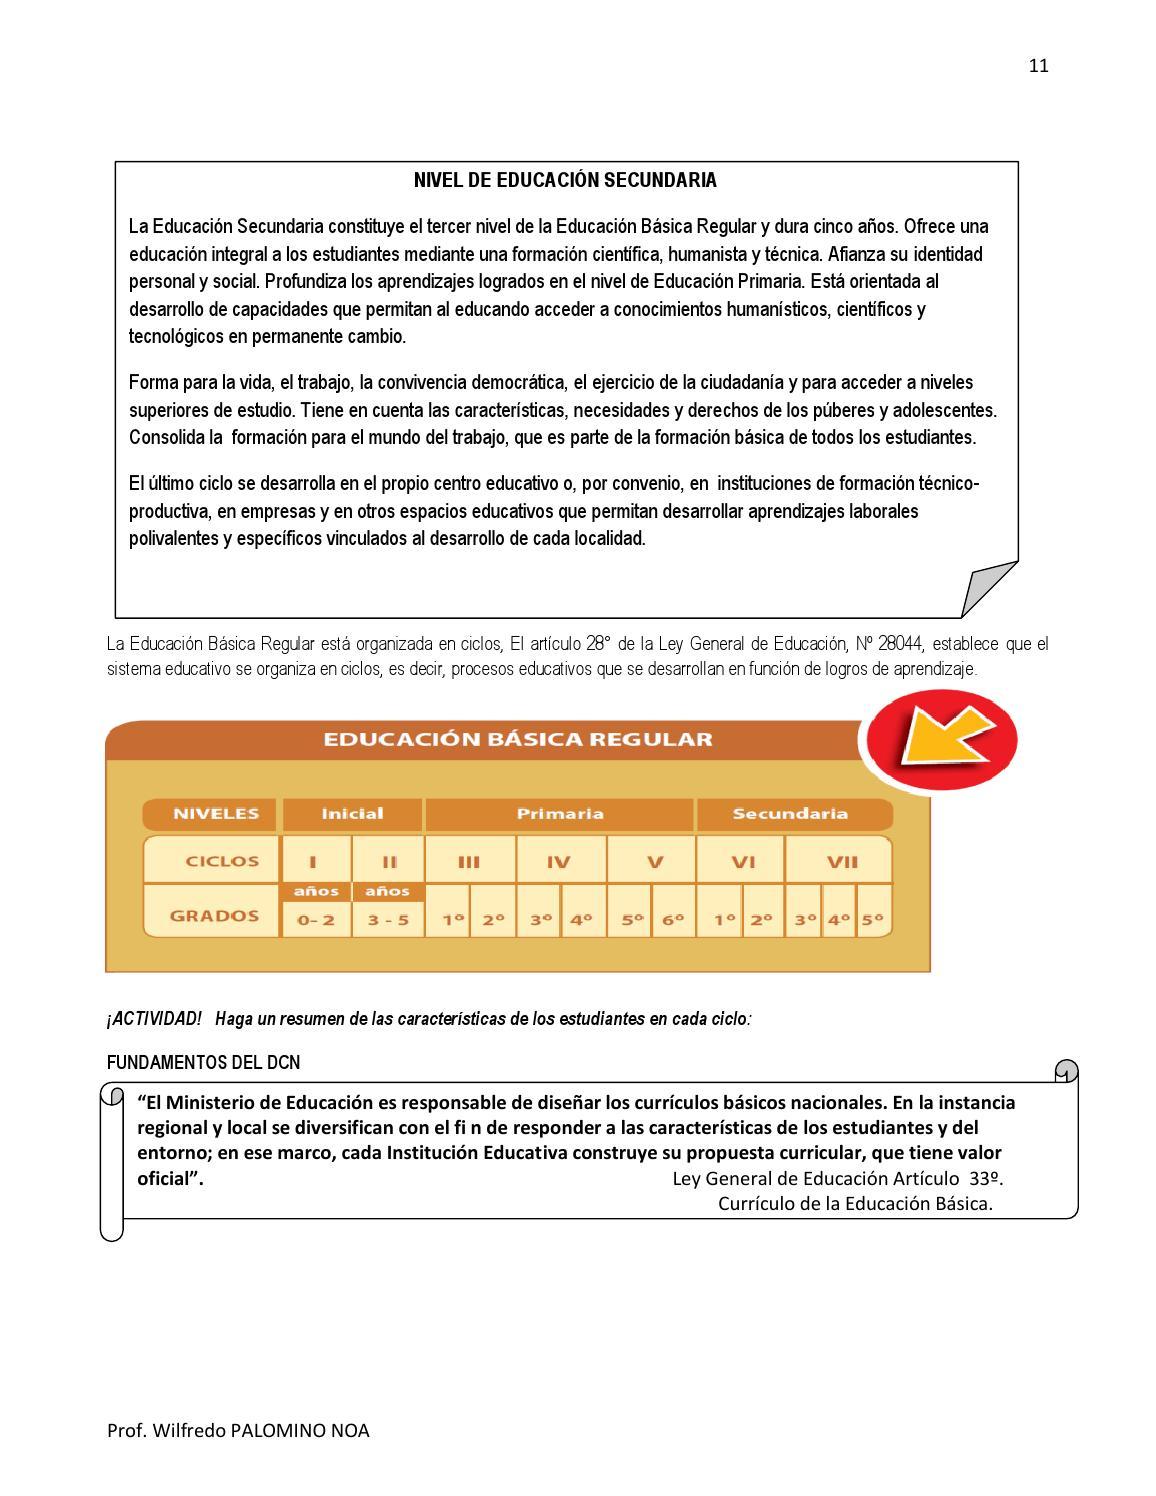 Diseño curricular aspectos generales by Wilfredo PALOMINO NOA - issuu